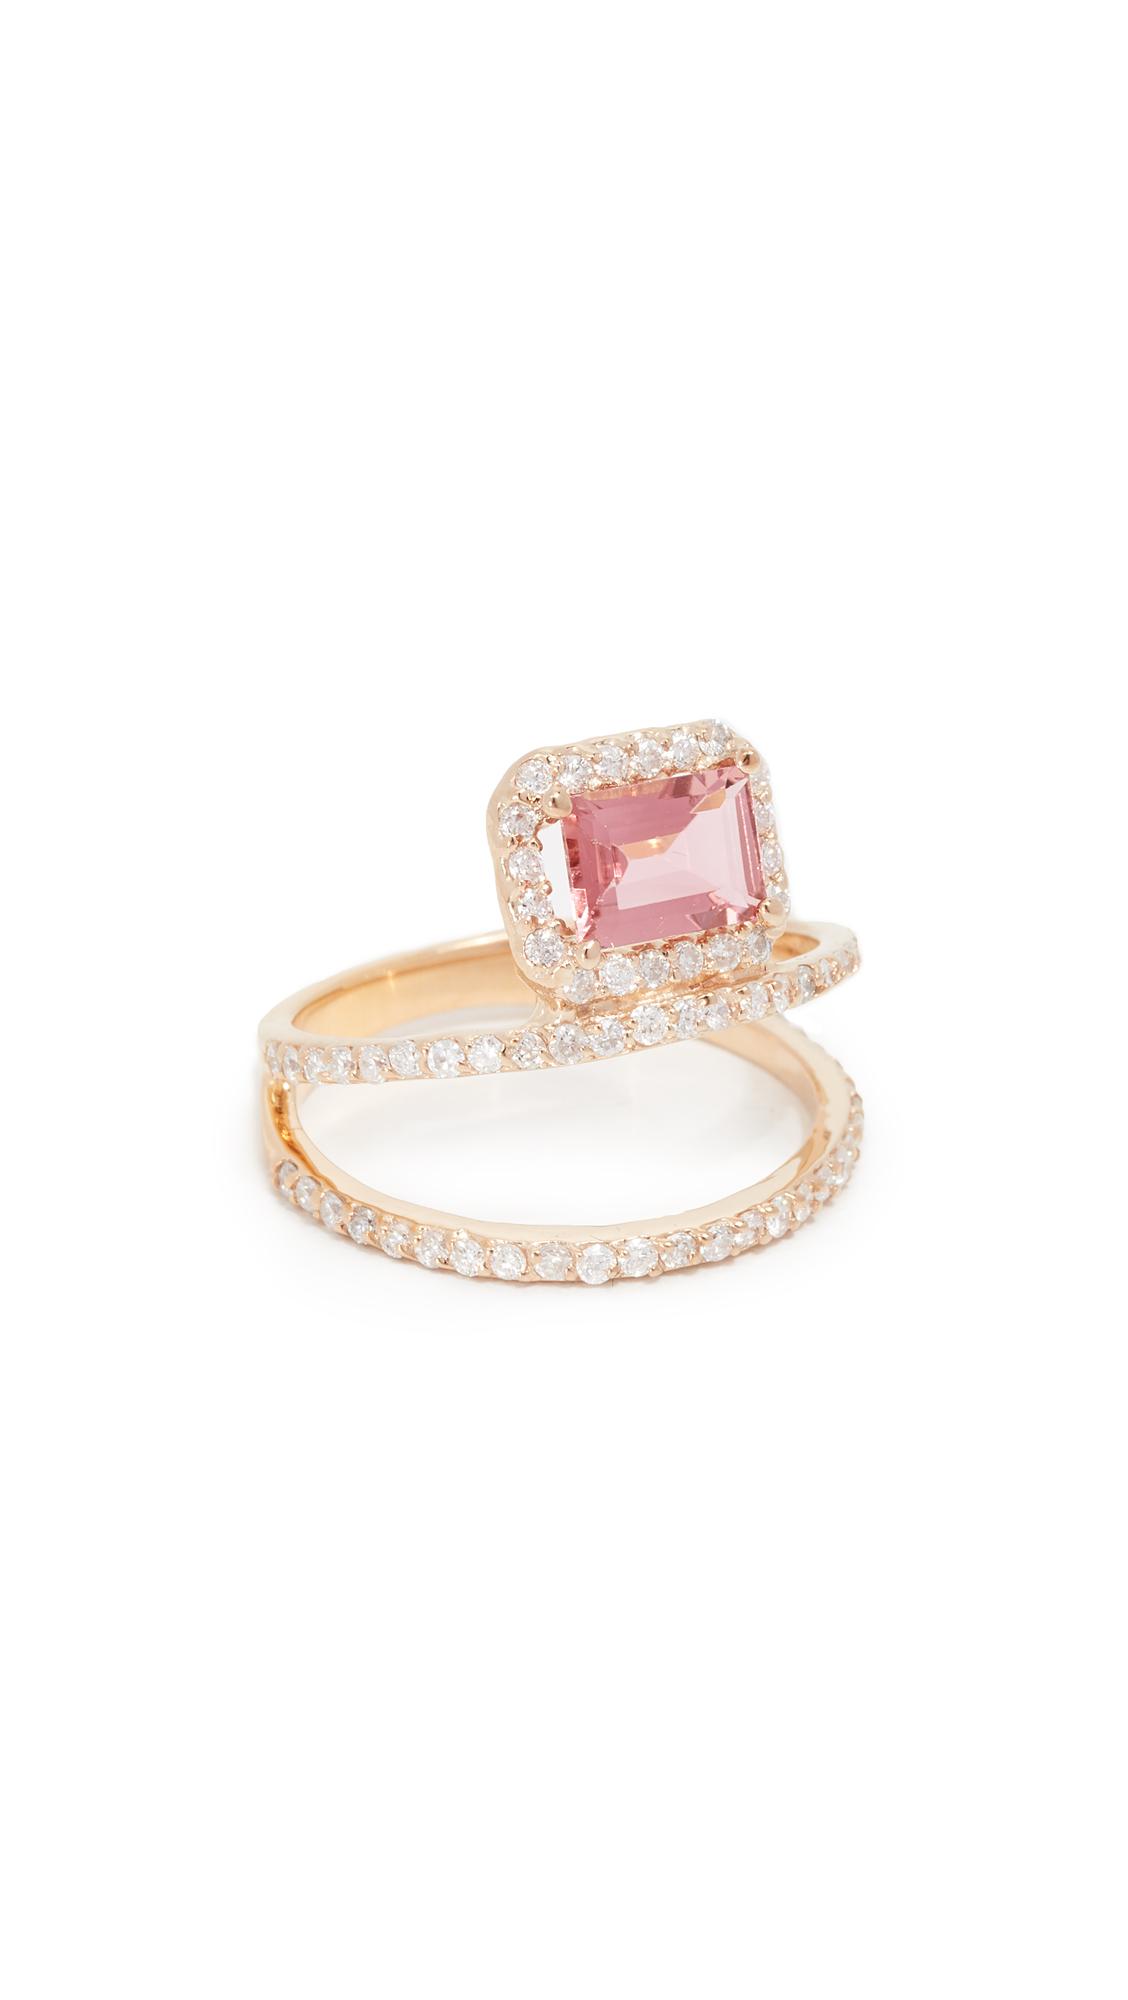 14K Gold Double Diamond Bar Ring, Yellow Gold/Pink